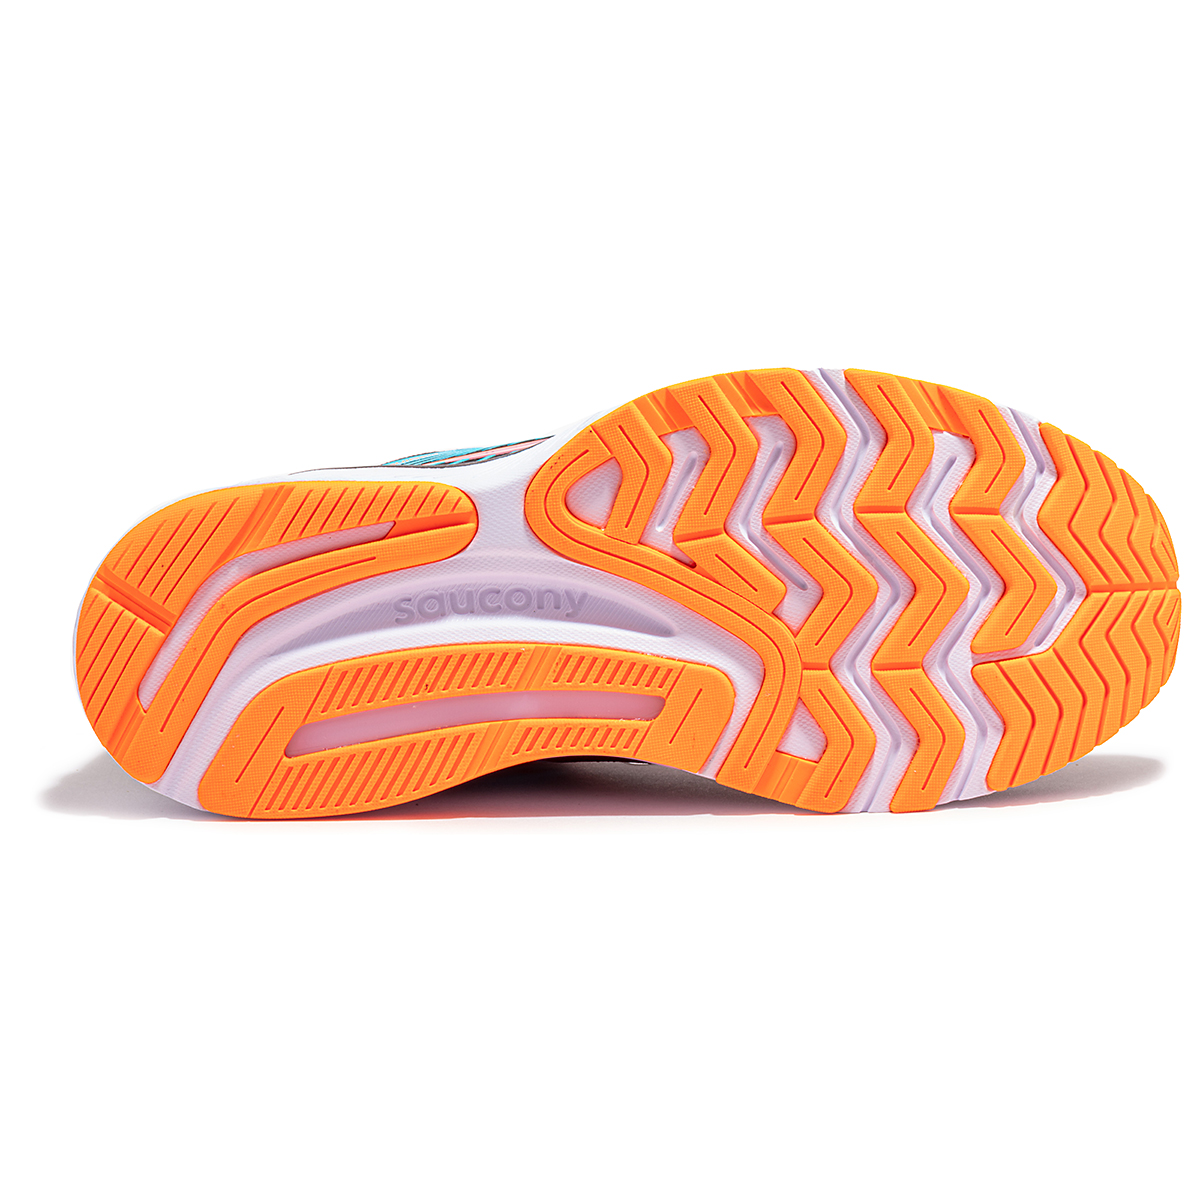 Women's Saucony Guide 14 Running Shoe - Color: Future/Black - Size: 5 - Width: Regular, Future/Black, large, image 5